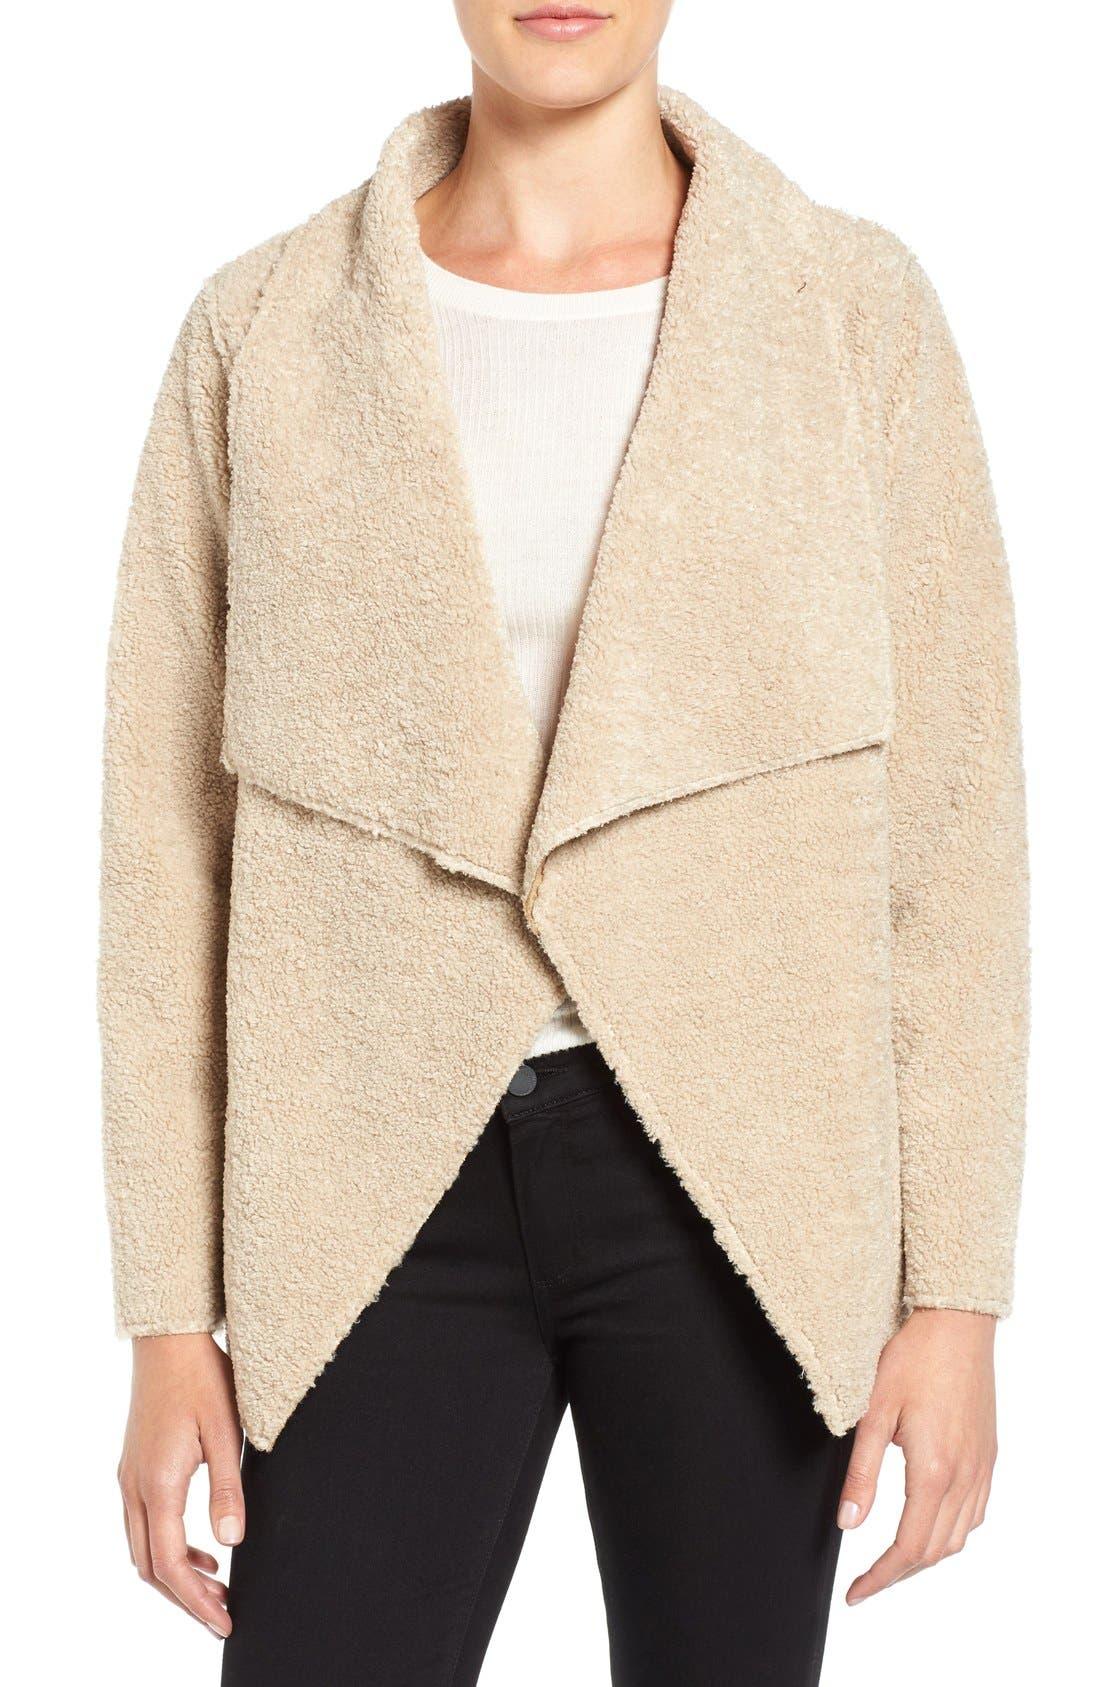 Alternate Image 1 Selected - Velvet by Graham & Spencer 'Lux' Reversible Faux Shearling Drape Front Jacket